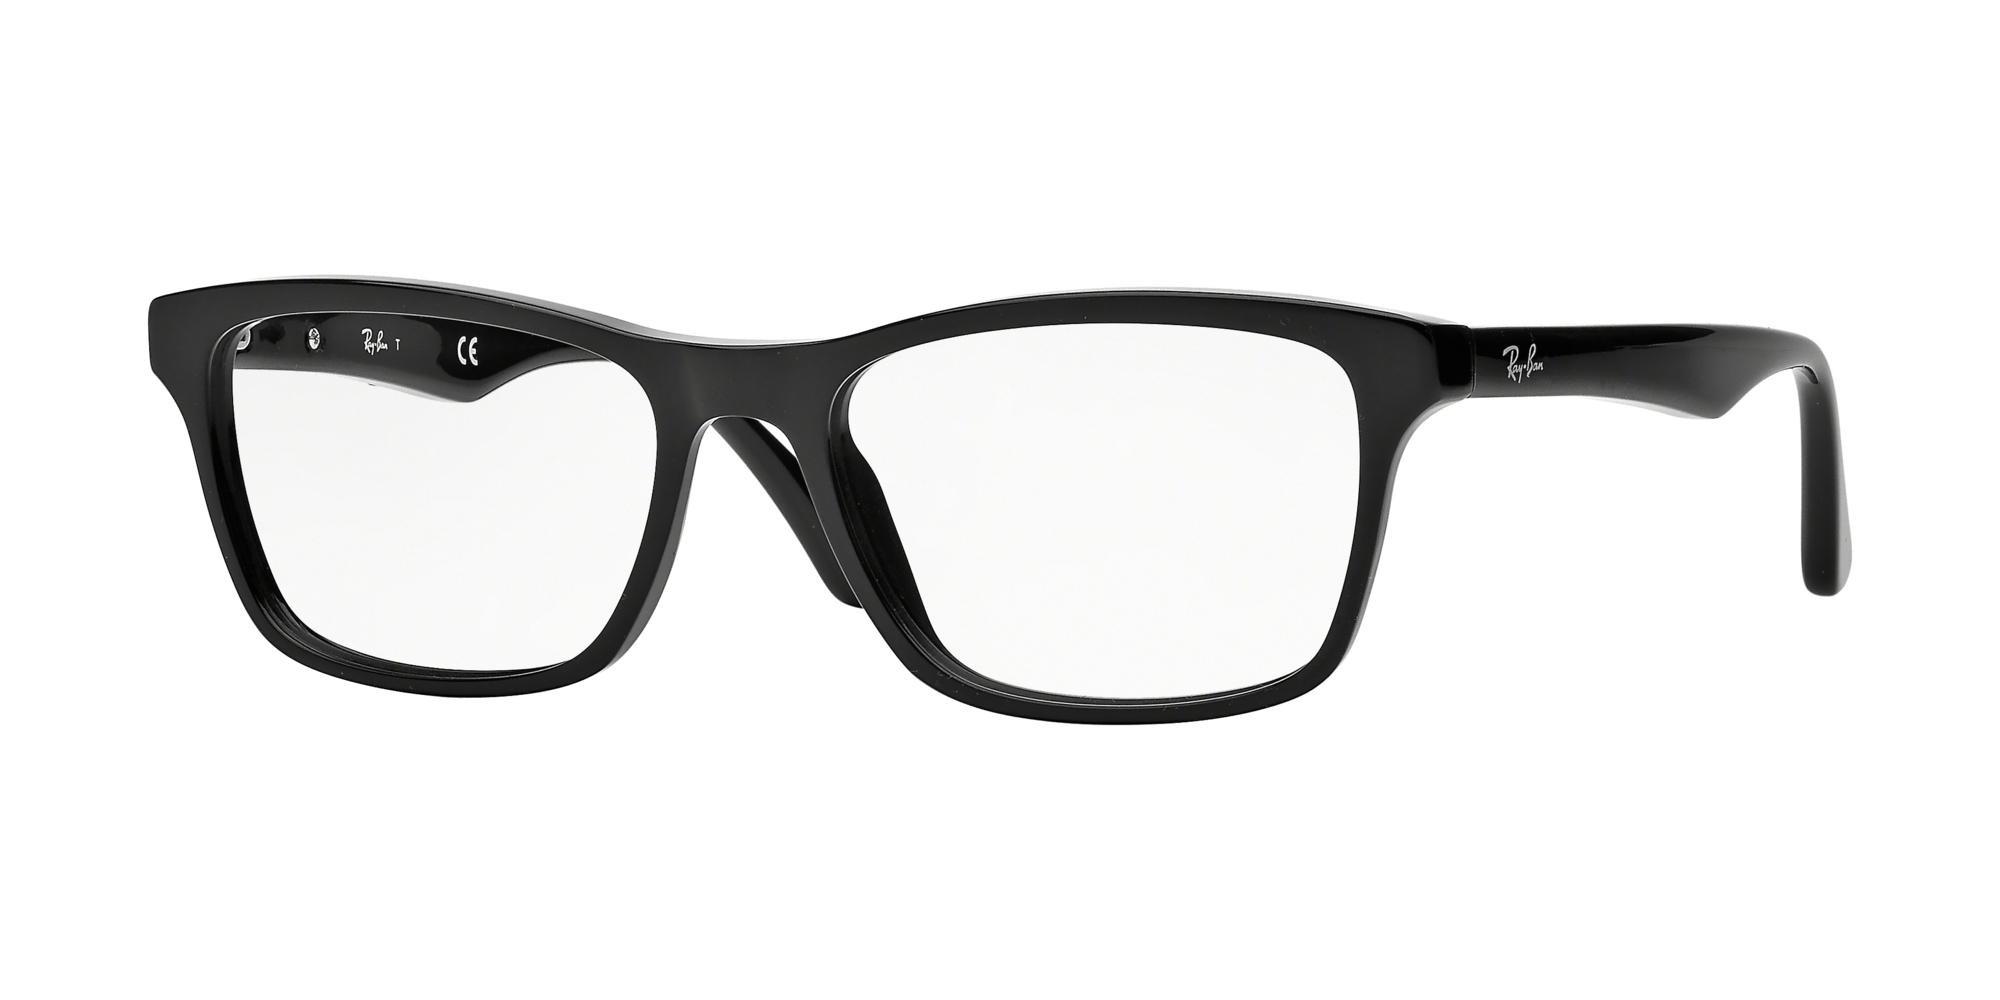 Ray-Ban eyeglasses RX 5279